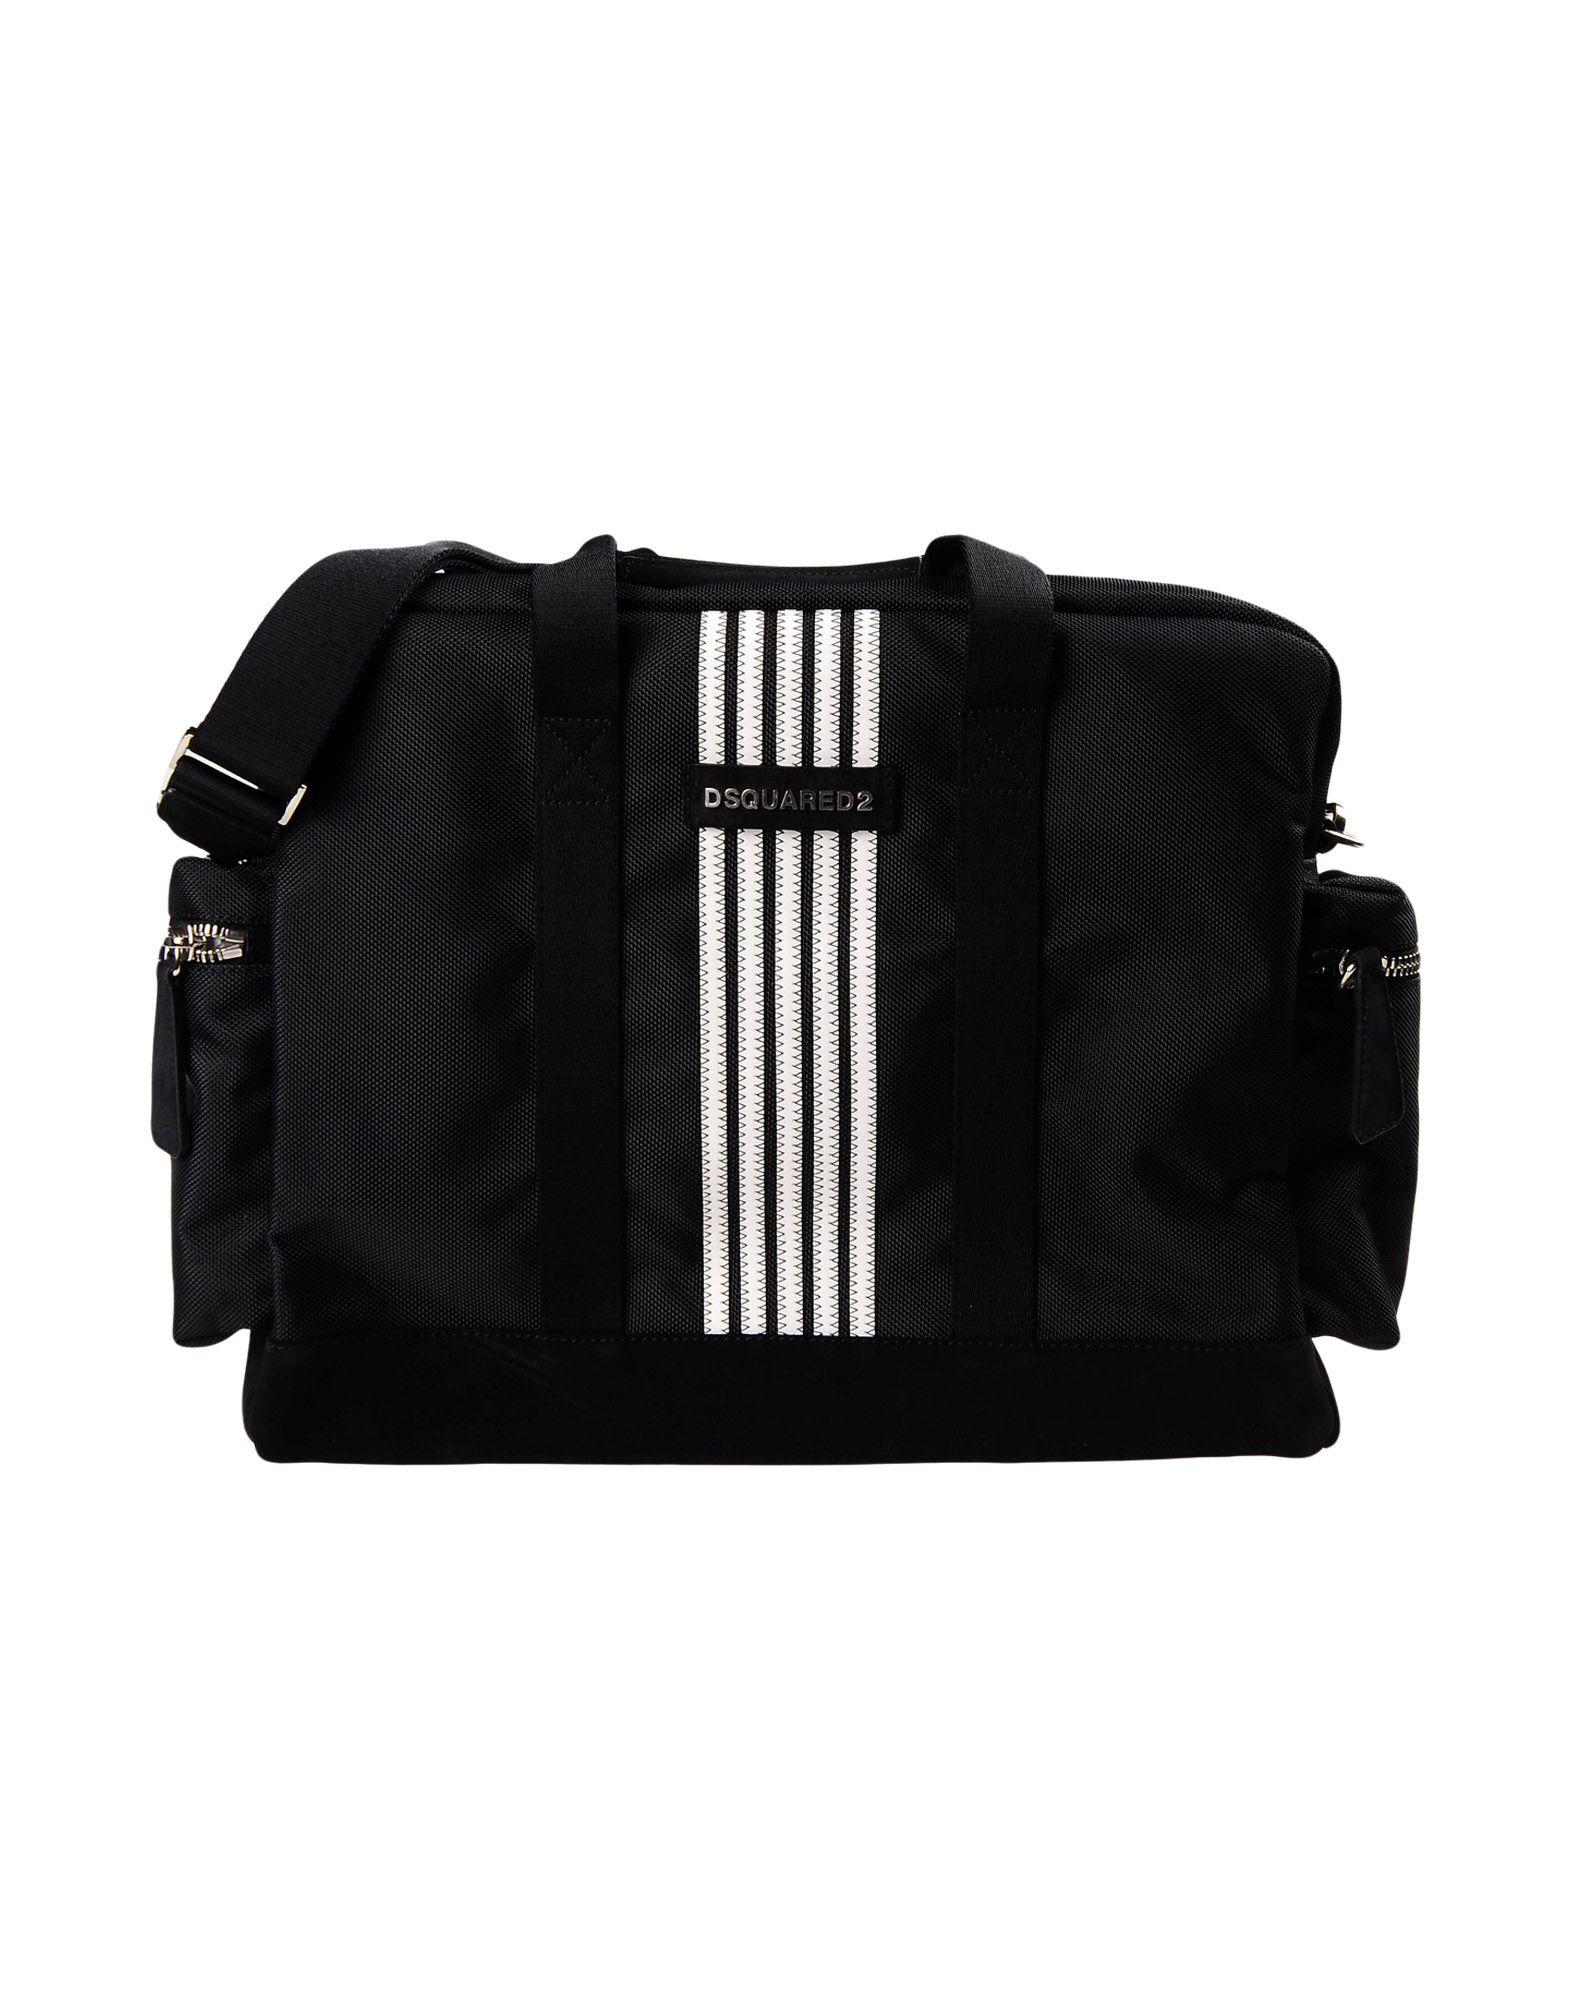 DSQUARED2 Деловые сумки bag giulia monti сумки деловые